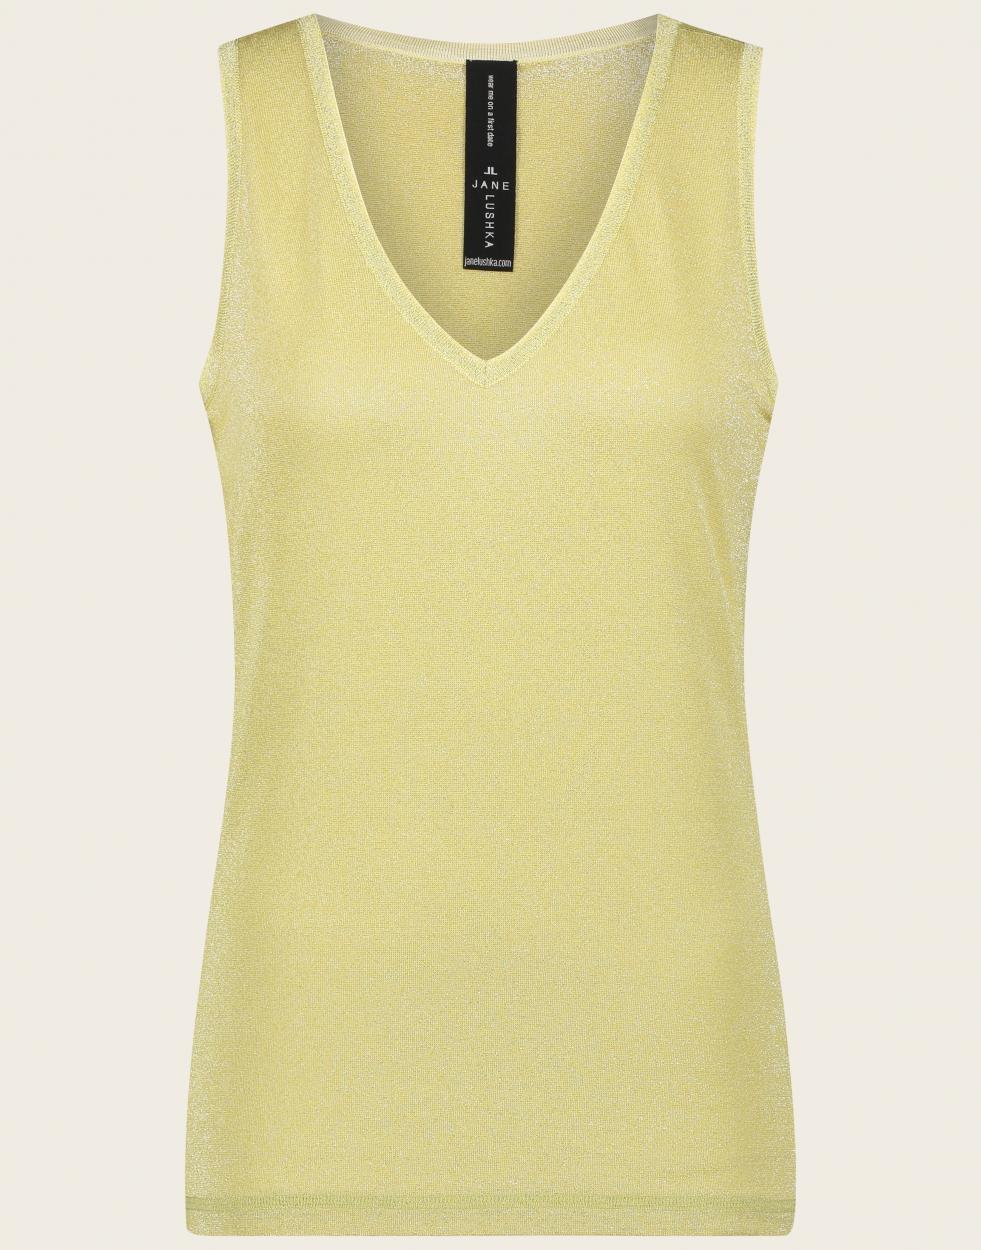 Jane Lushka ärmelloses Shirt gold